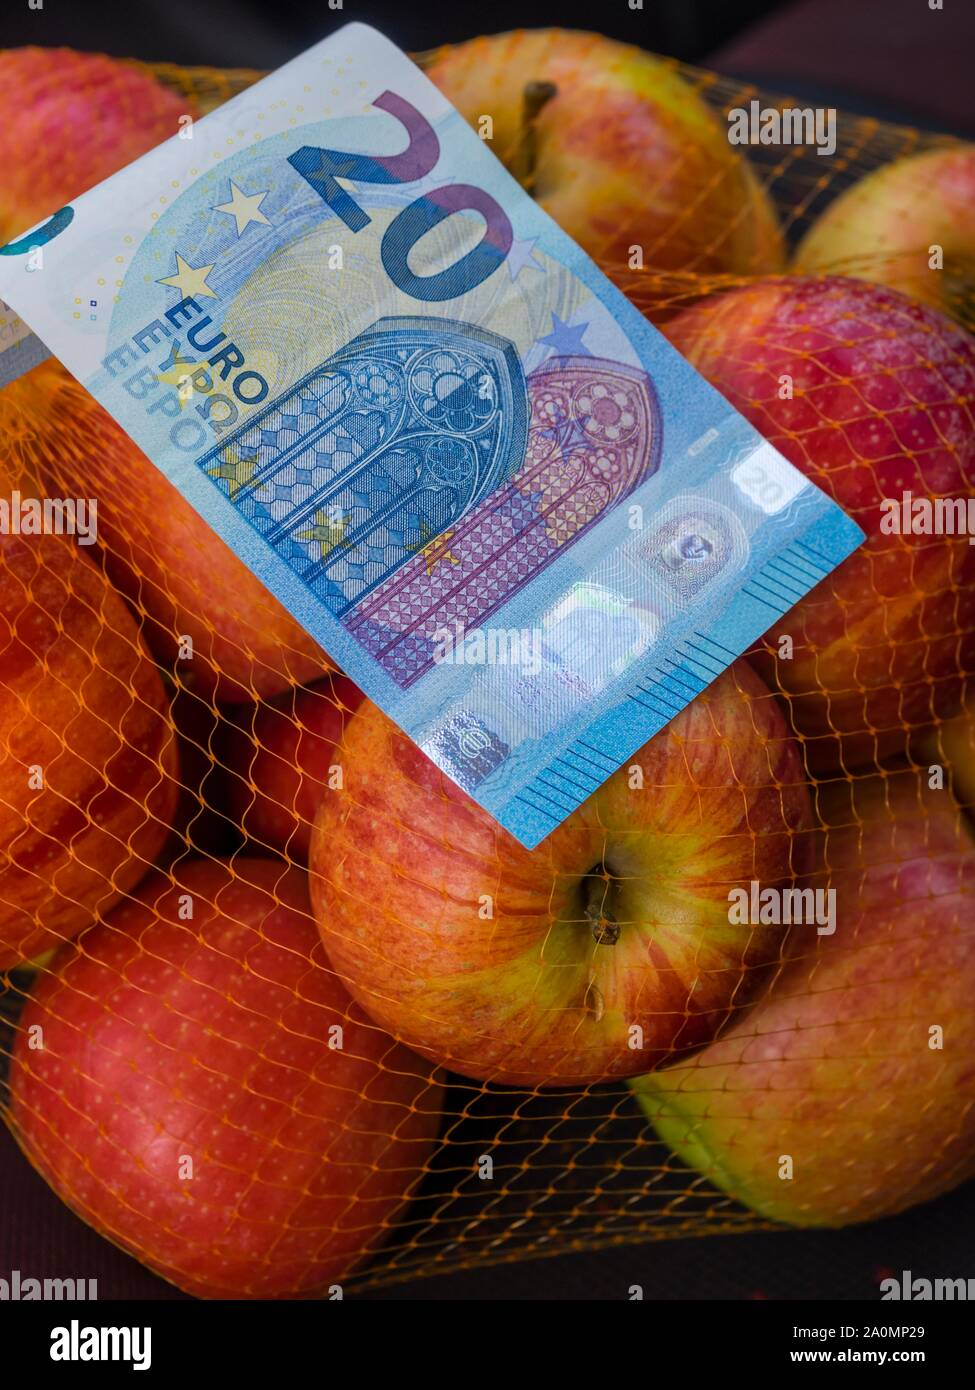 Apple fruit in backet and paper banknote money 20 twenty Euros Euro European Europe Stock Photo